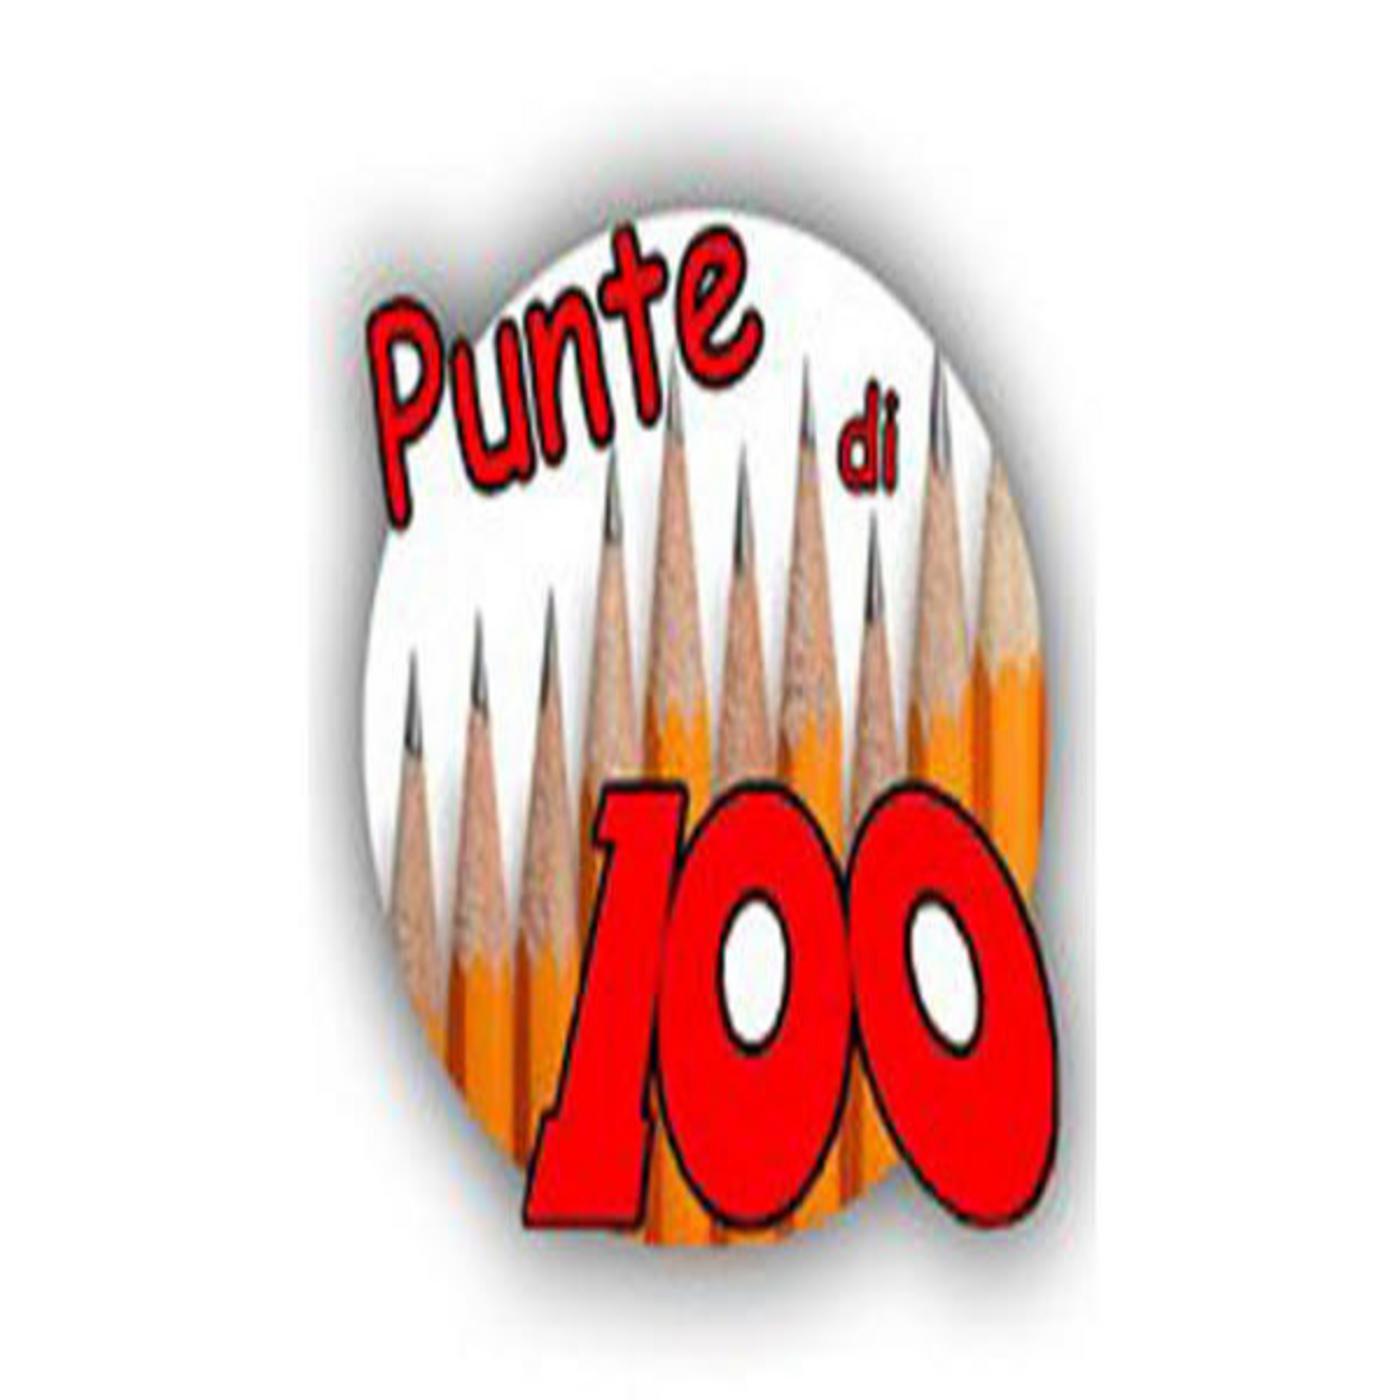 #PuntediChampions - Marted� 20/10/2020